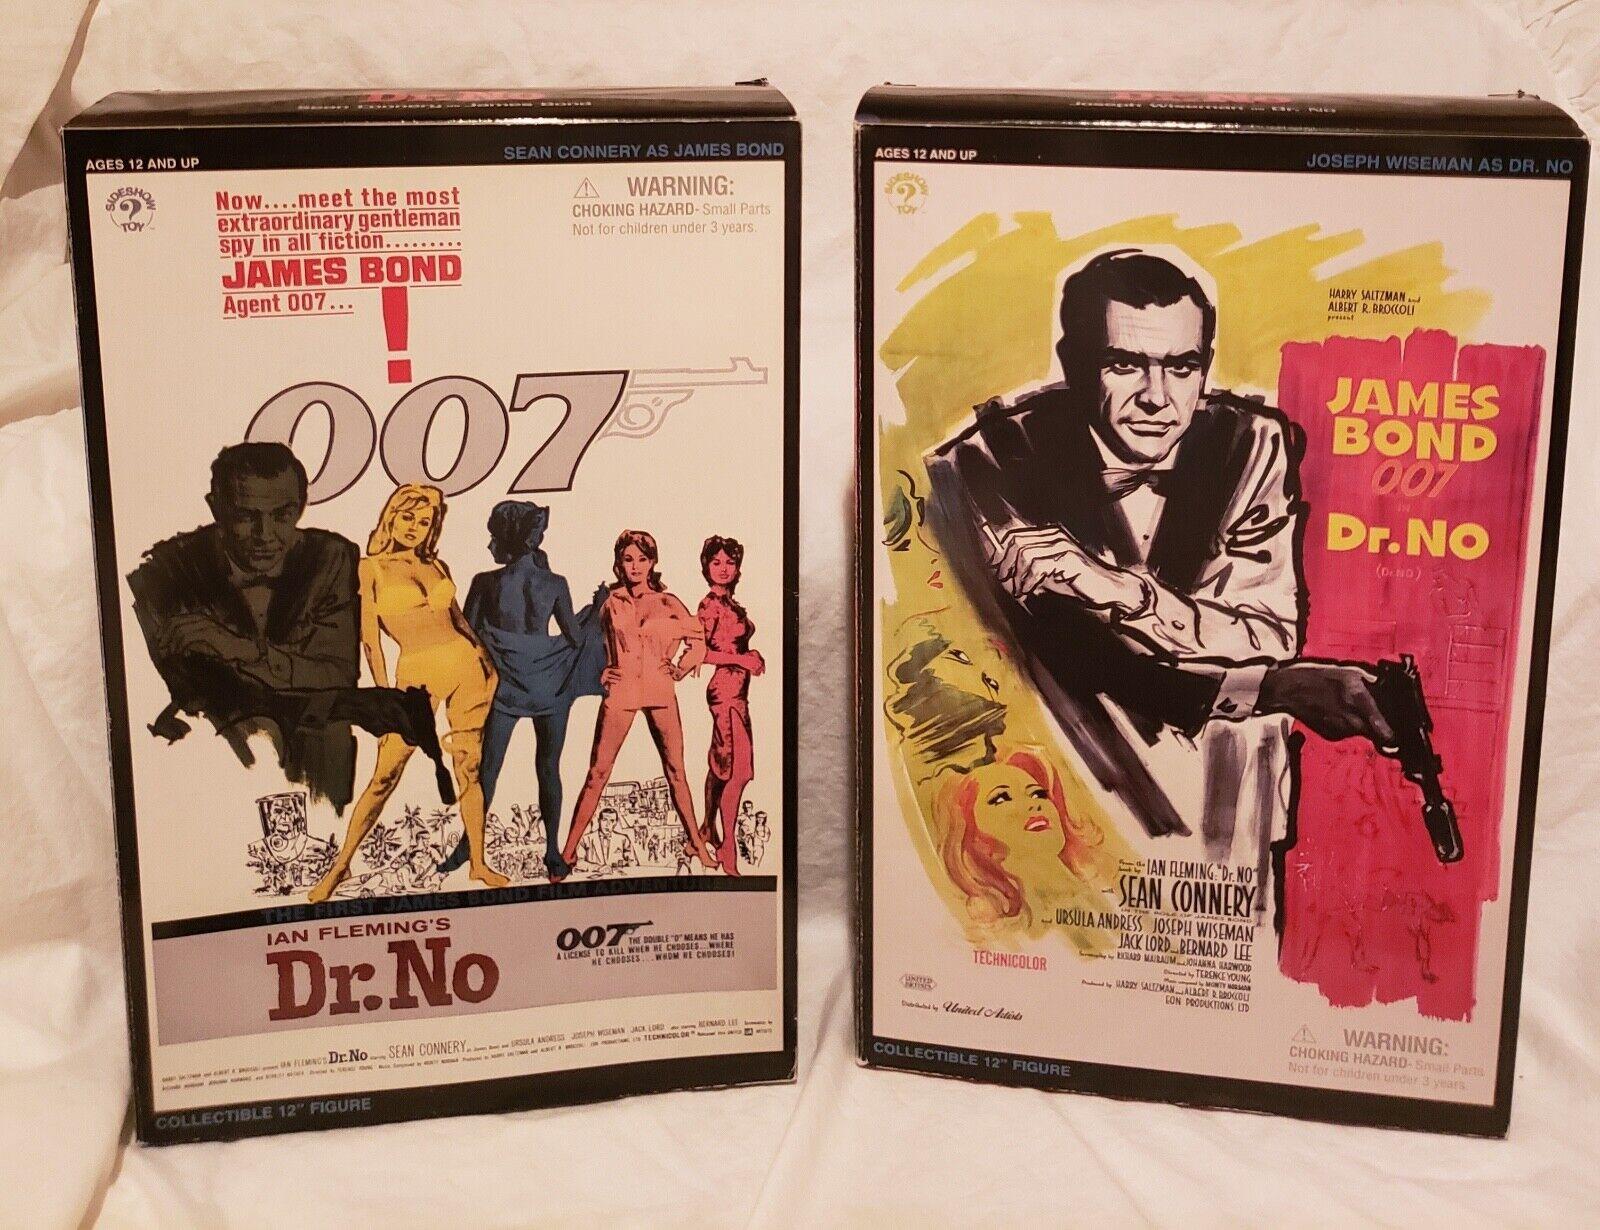 SIDESHOW DR. NO  JAMES BOND AGENT 007 &  DR. NO SET OF 2 12  FIGURES...BOTH NEW